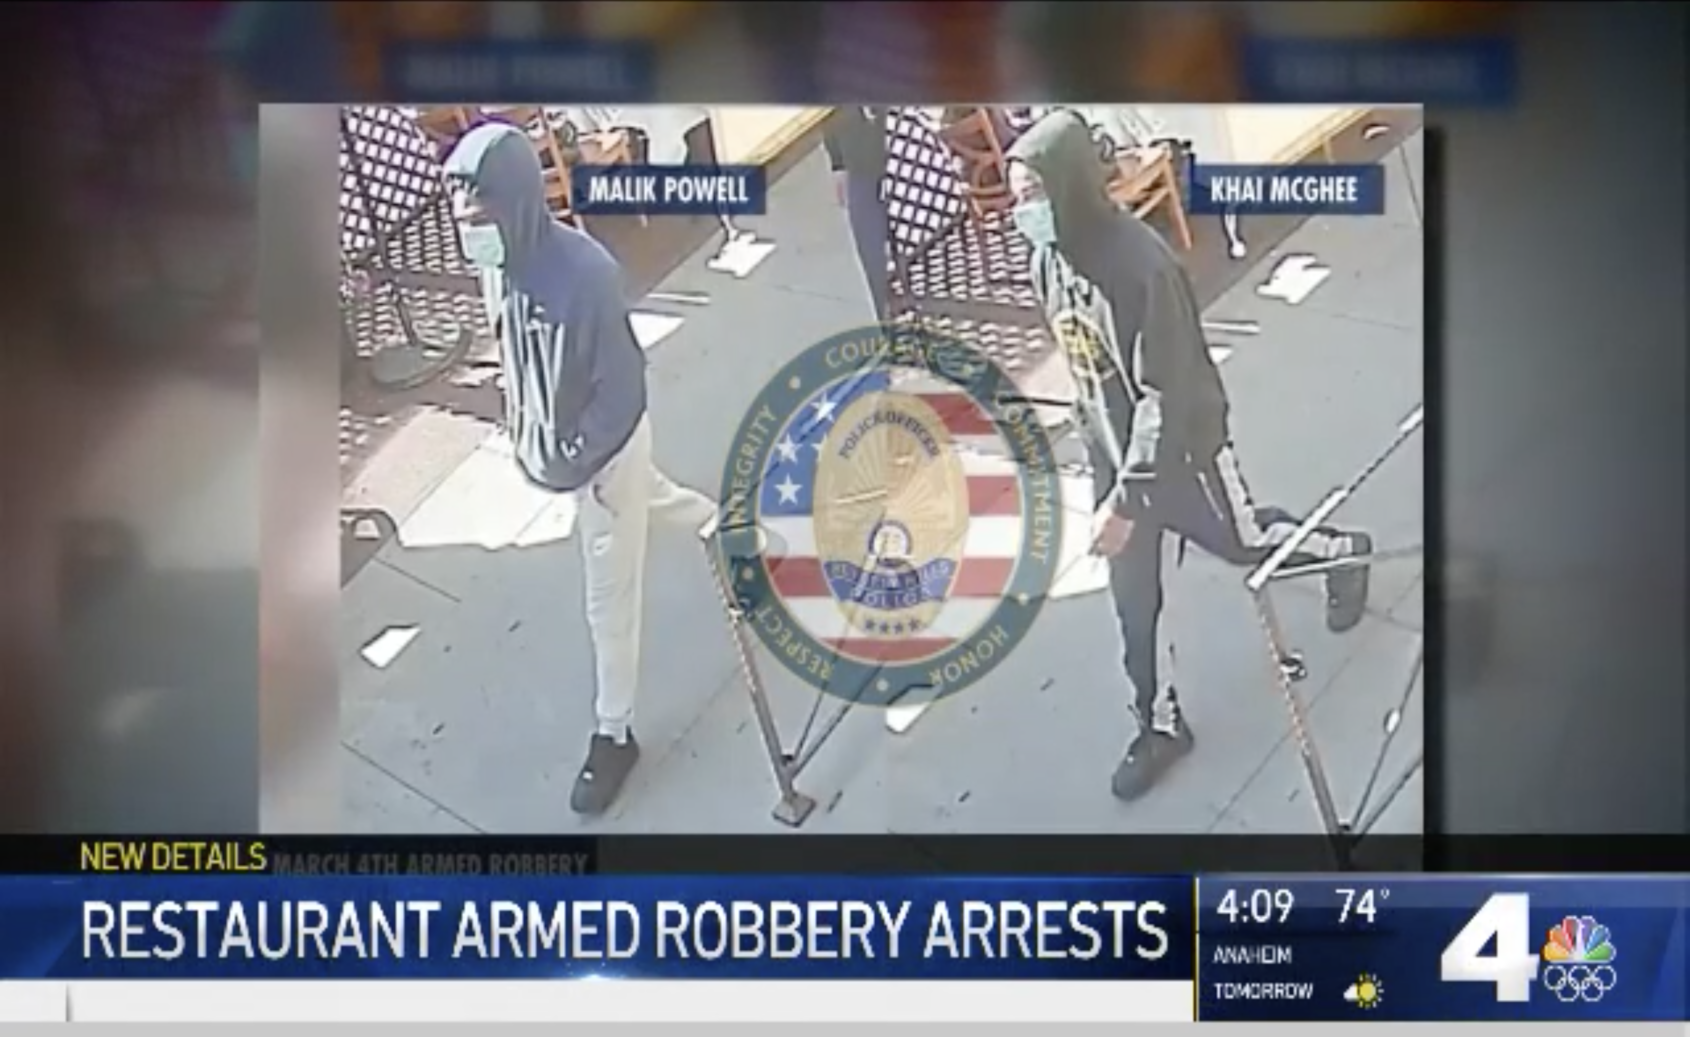 Richard Mille Robbery